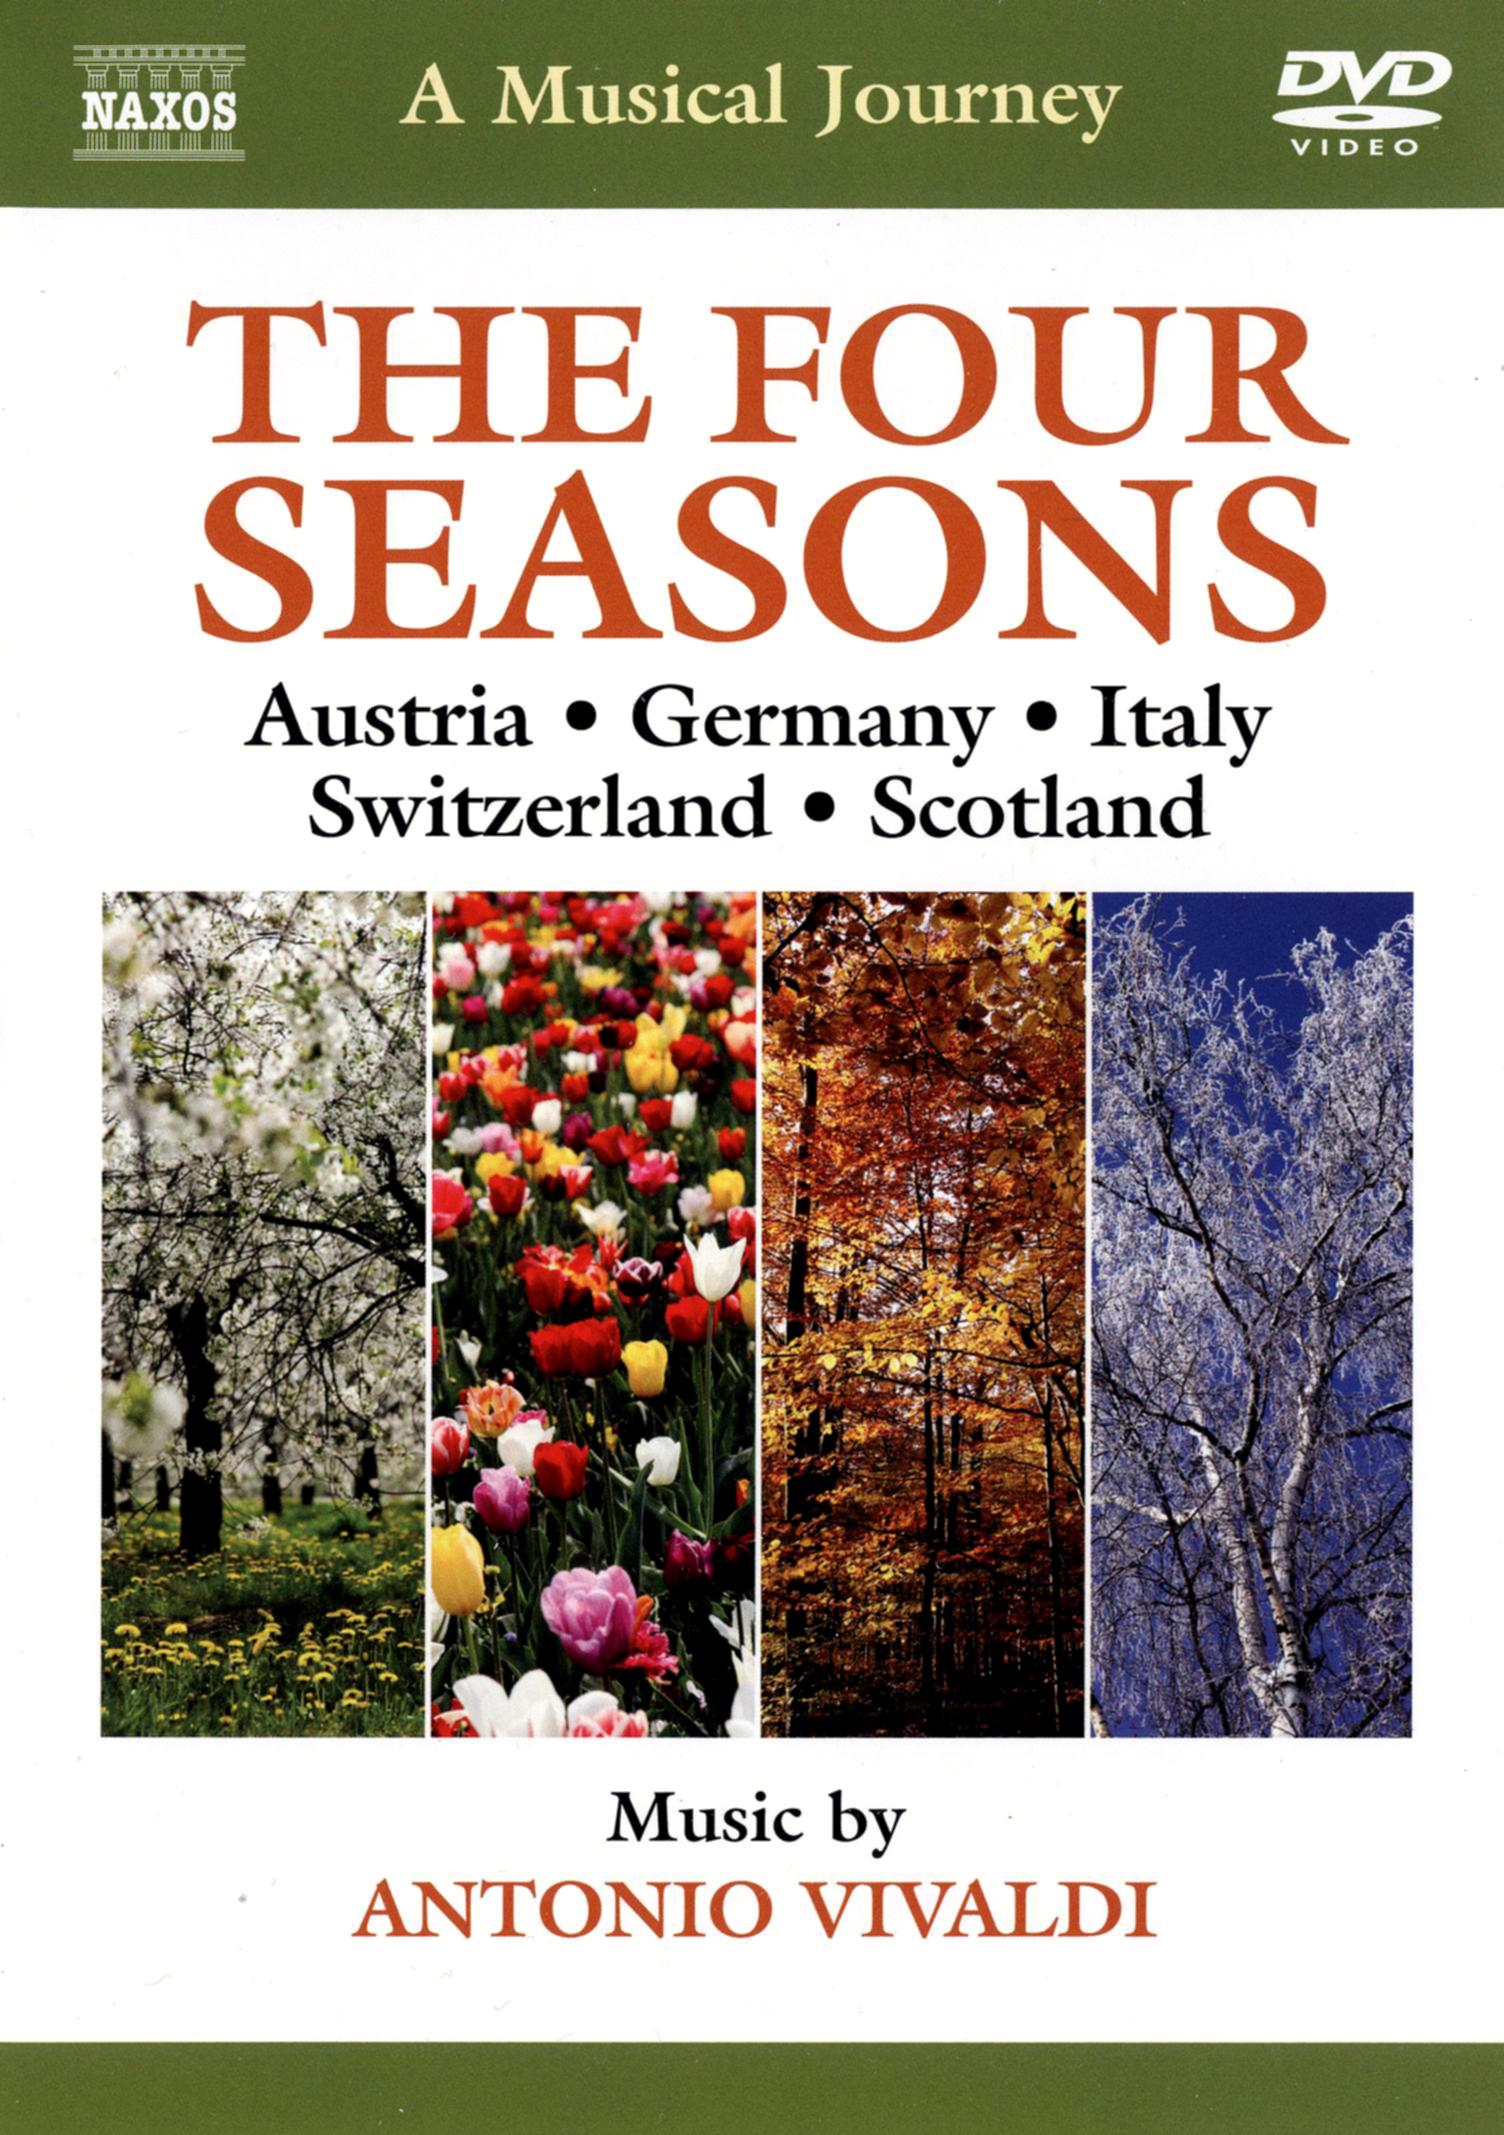 A Musical Journey: The Four Seasons - Austria/Germany/Italy/Switzerland/Scotland